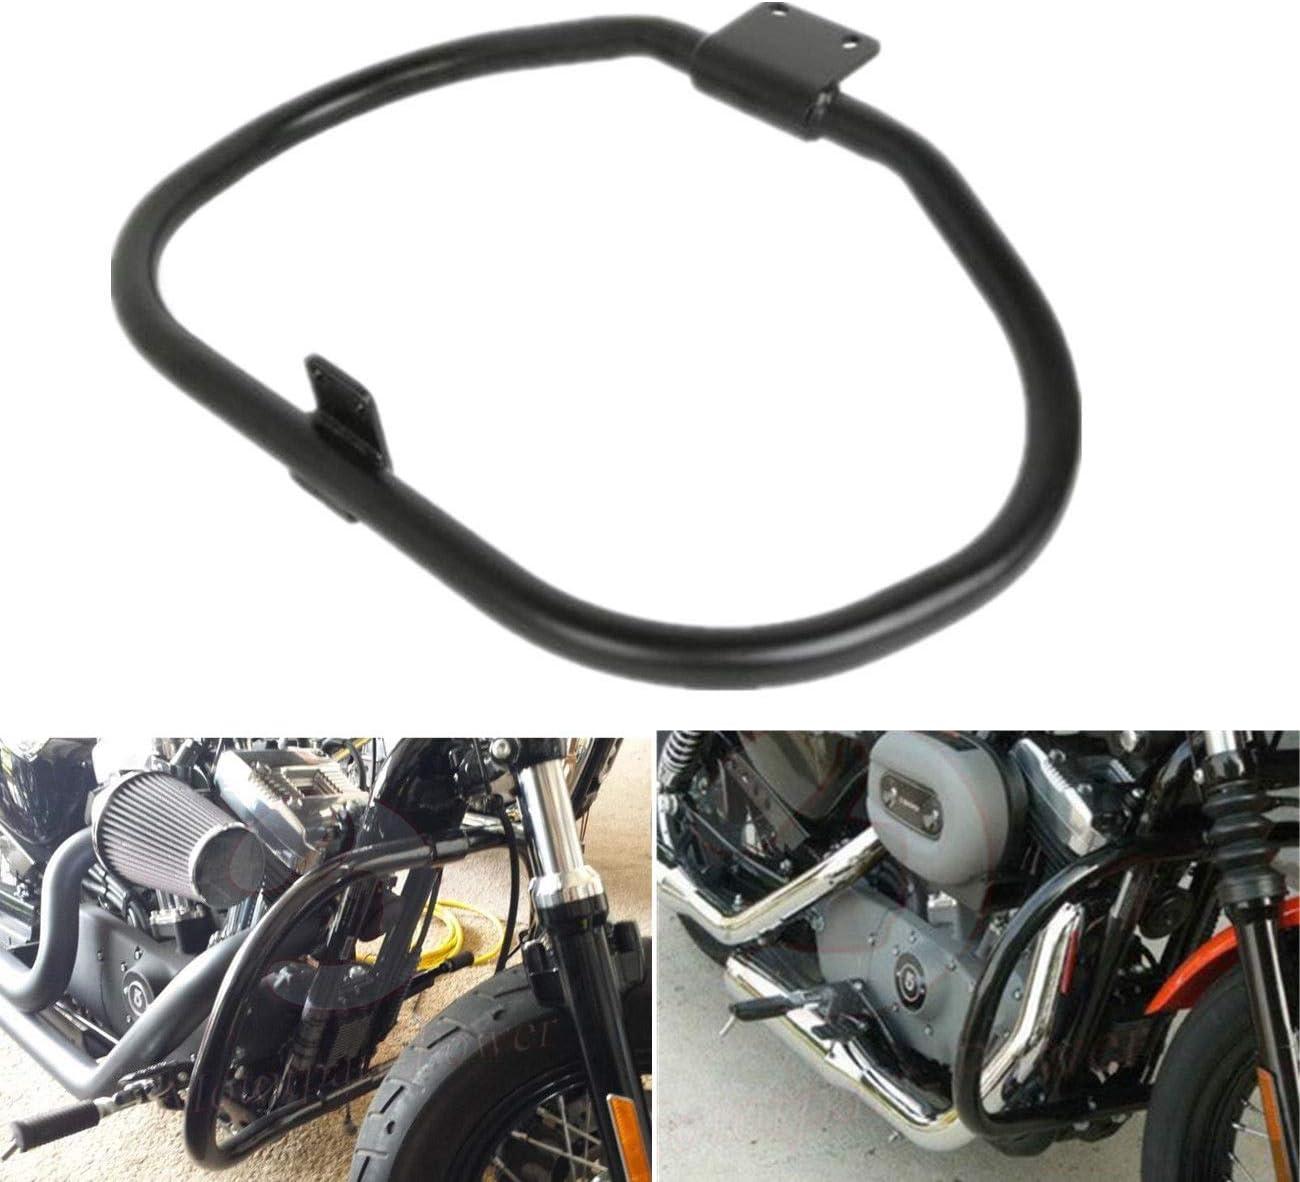 For Harley Iron 883 XL883N XL1200N XL1200L 48 XL1200X Sportster Crash Safety Bars Protection Artudatech Highway Rail Engine Guard